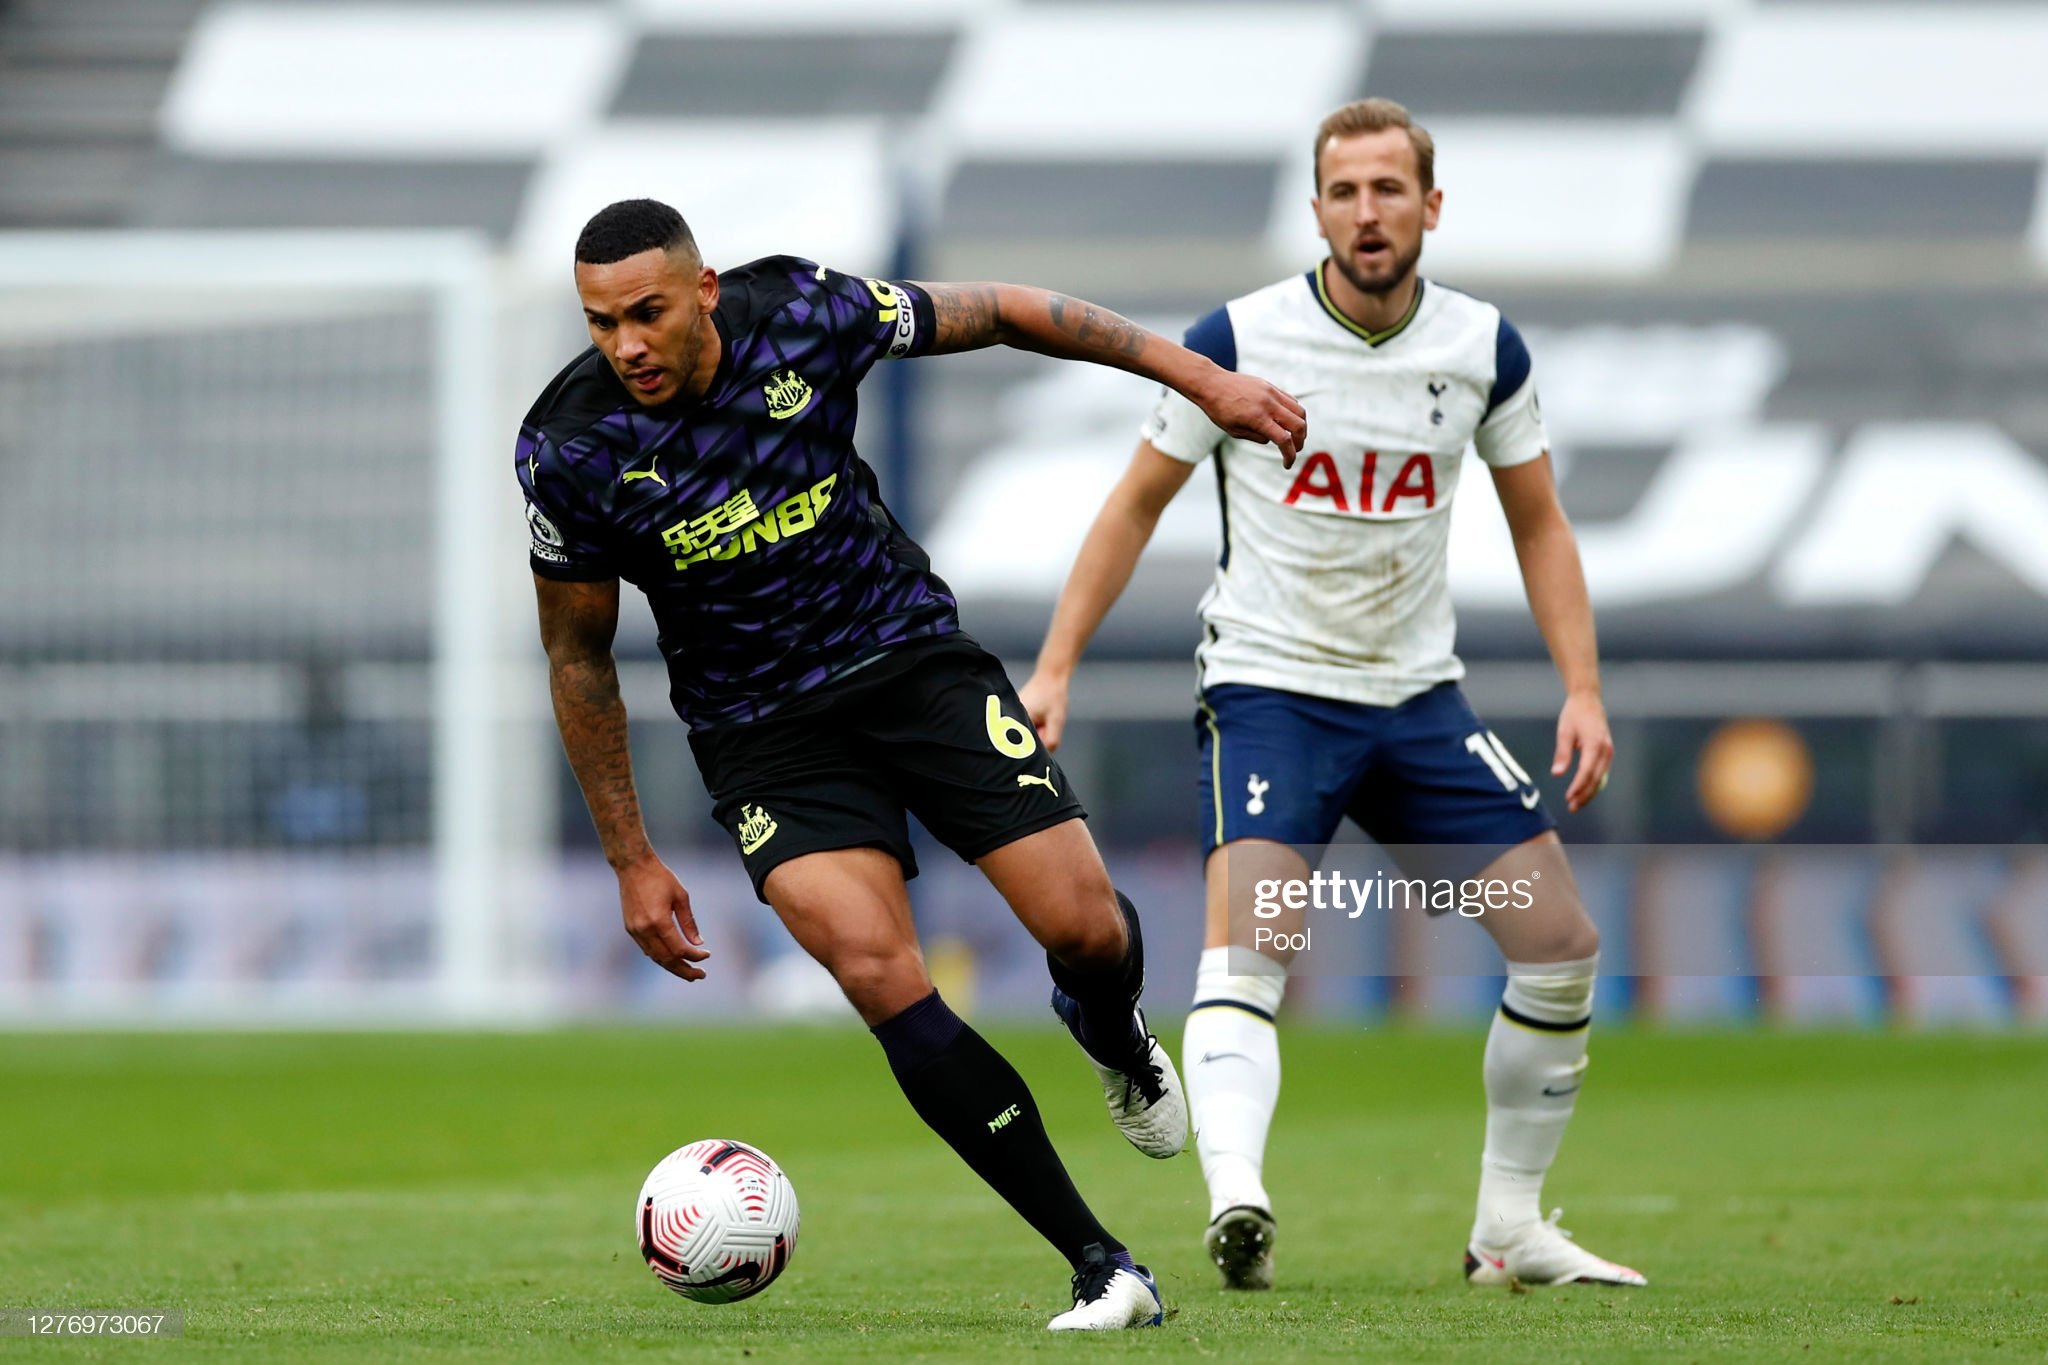 Newcastle vs Tottenham Preview, prediction and odds